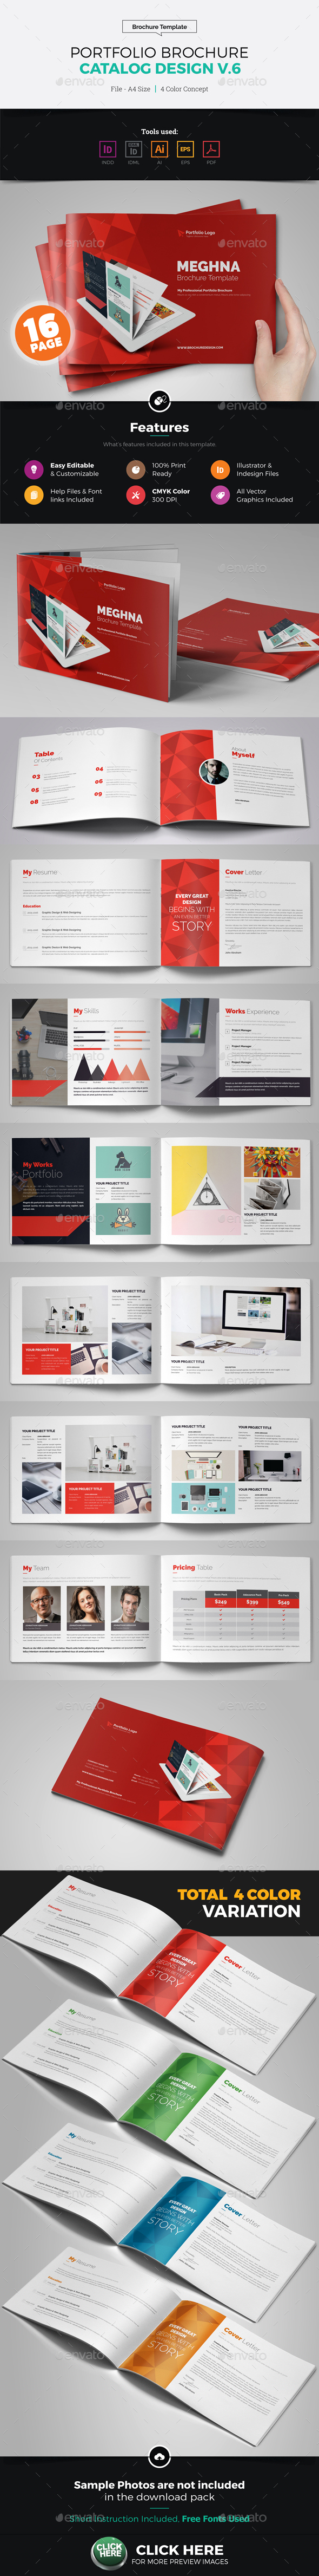 Portfolio Brochure Catalog Design v6 - Corporate Brochures